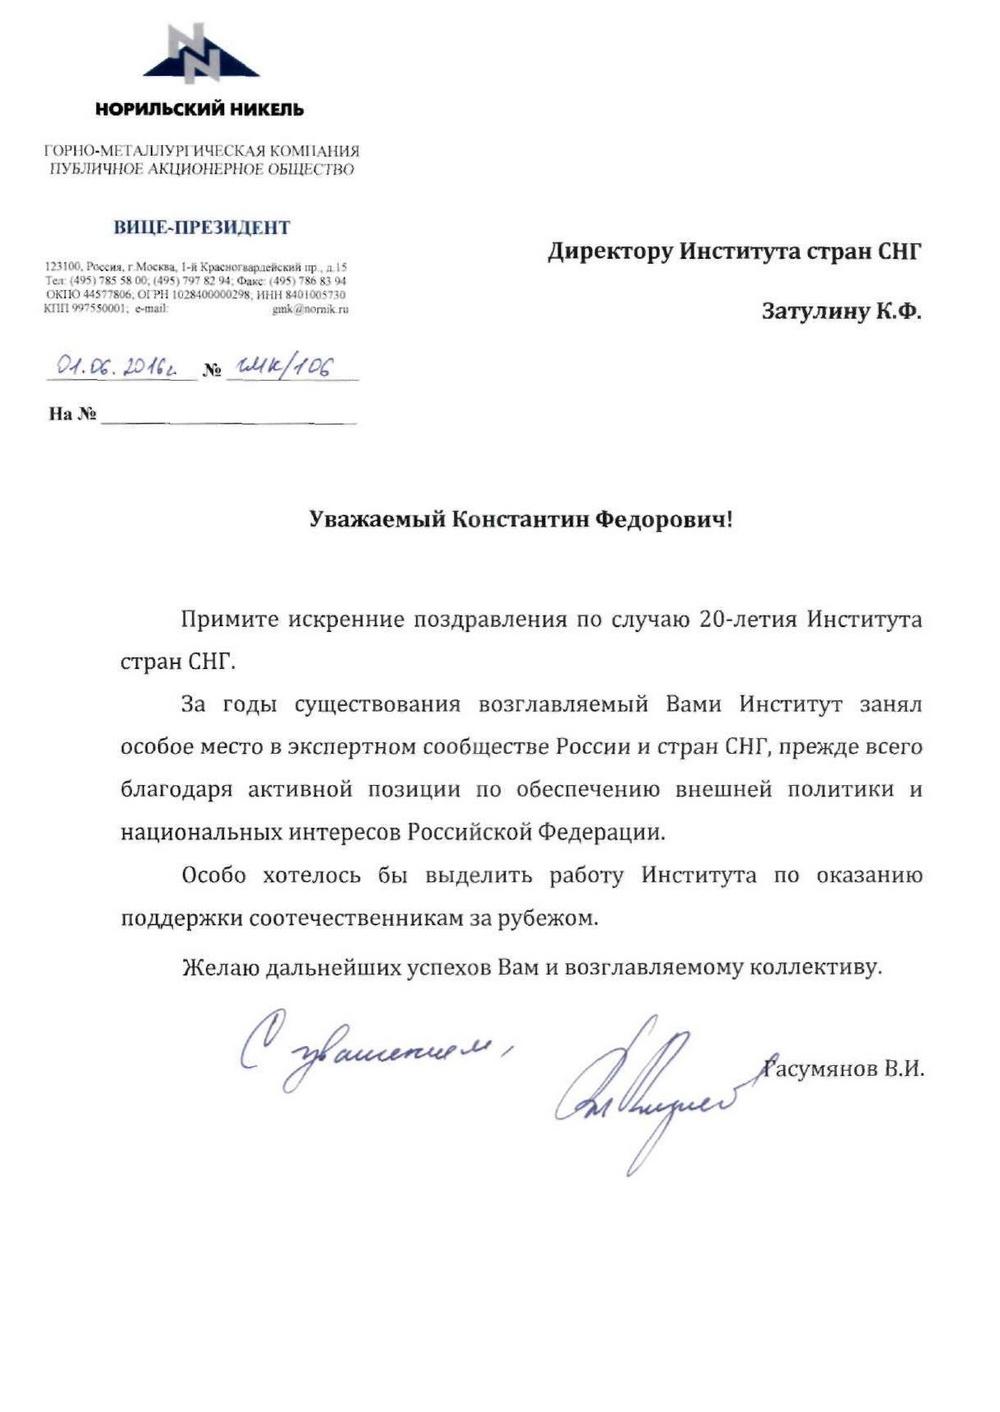 gasumyanov